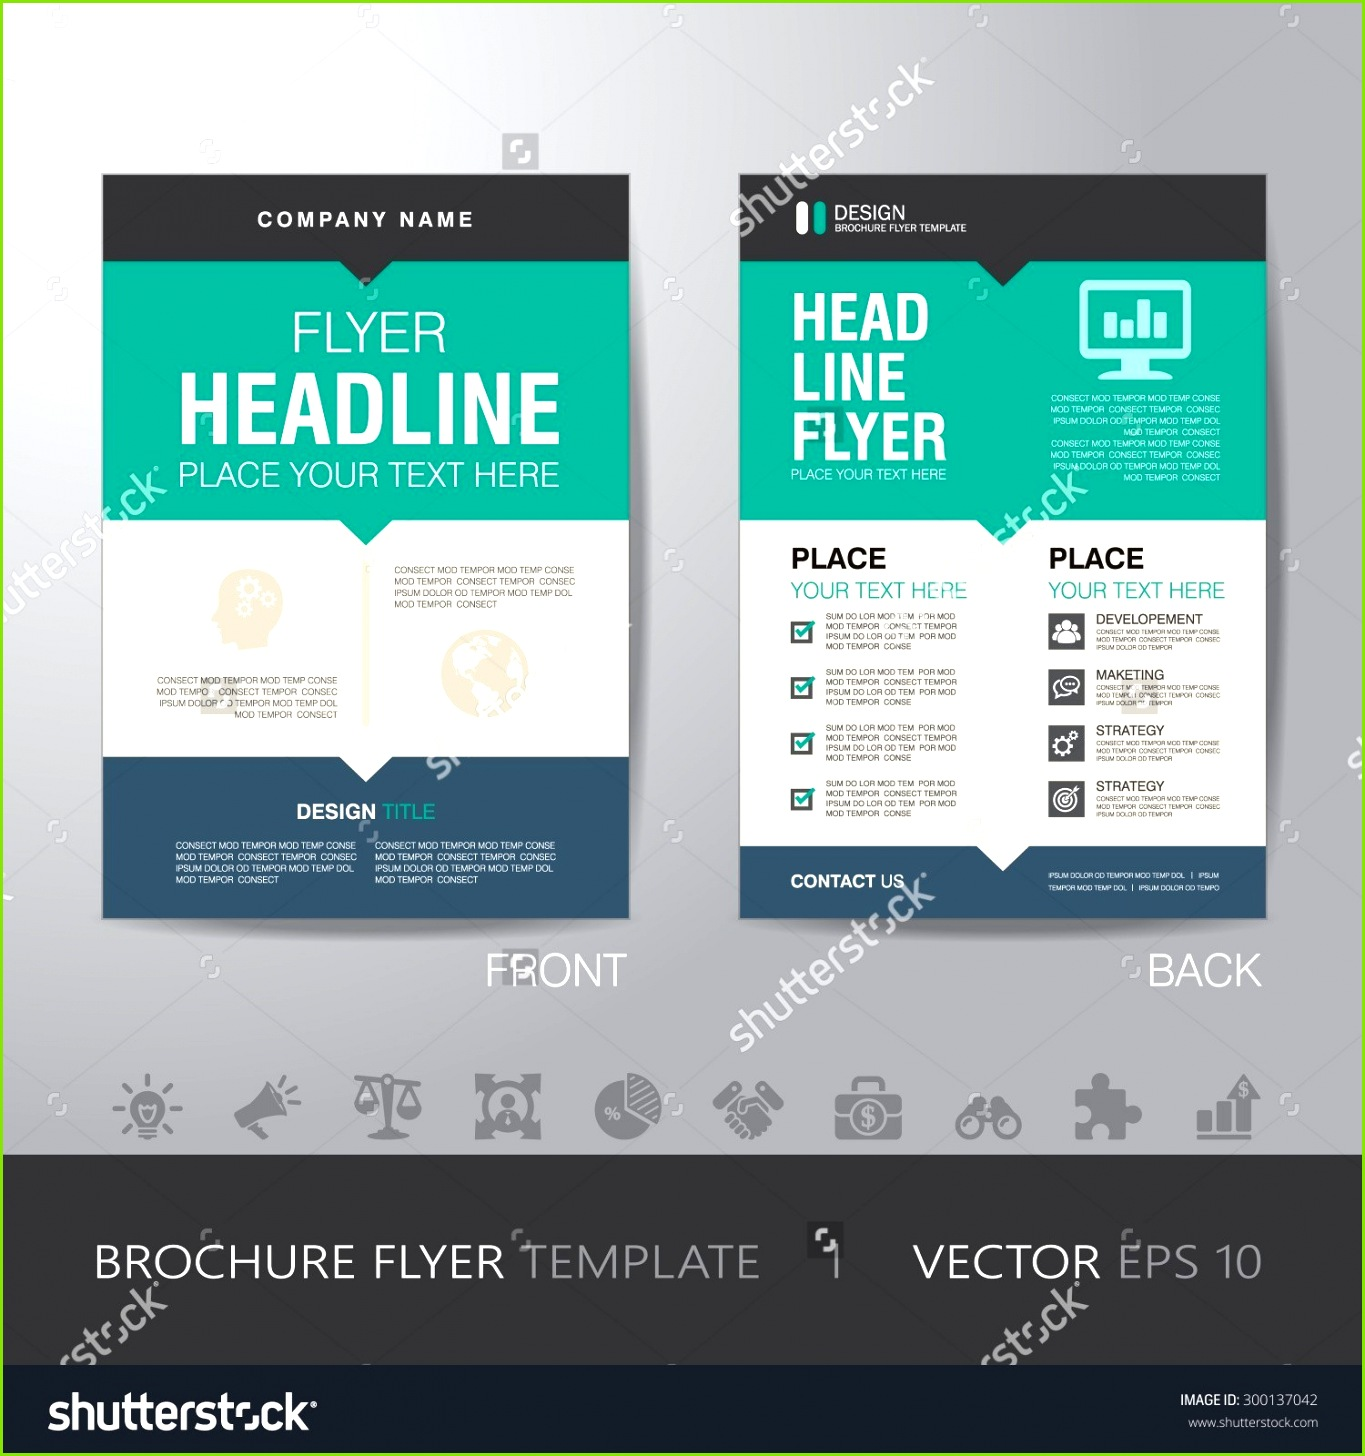 free mockup templates Inspirational Free Psd Flyer Templates Free Psd Business Flyer Templates Save